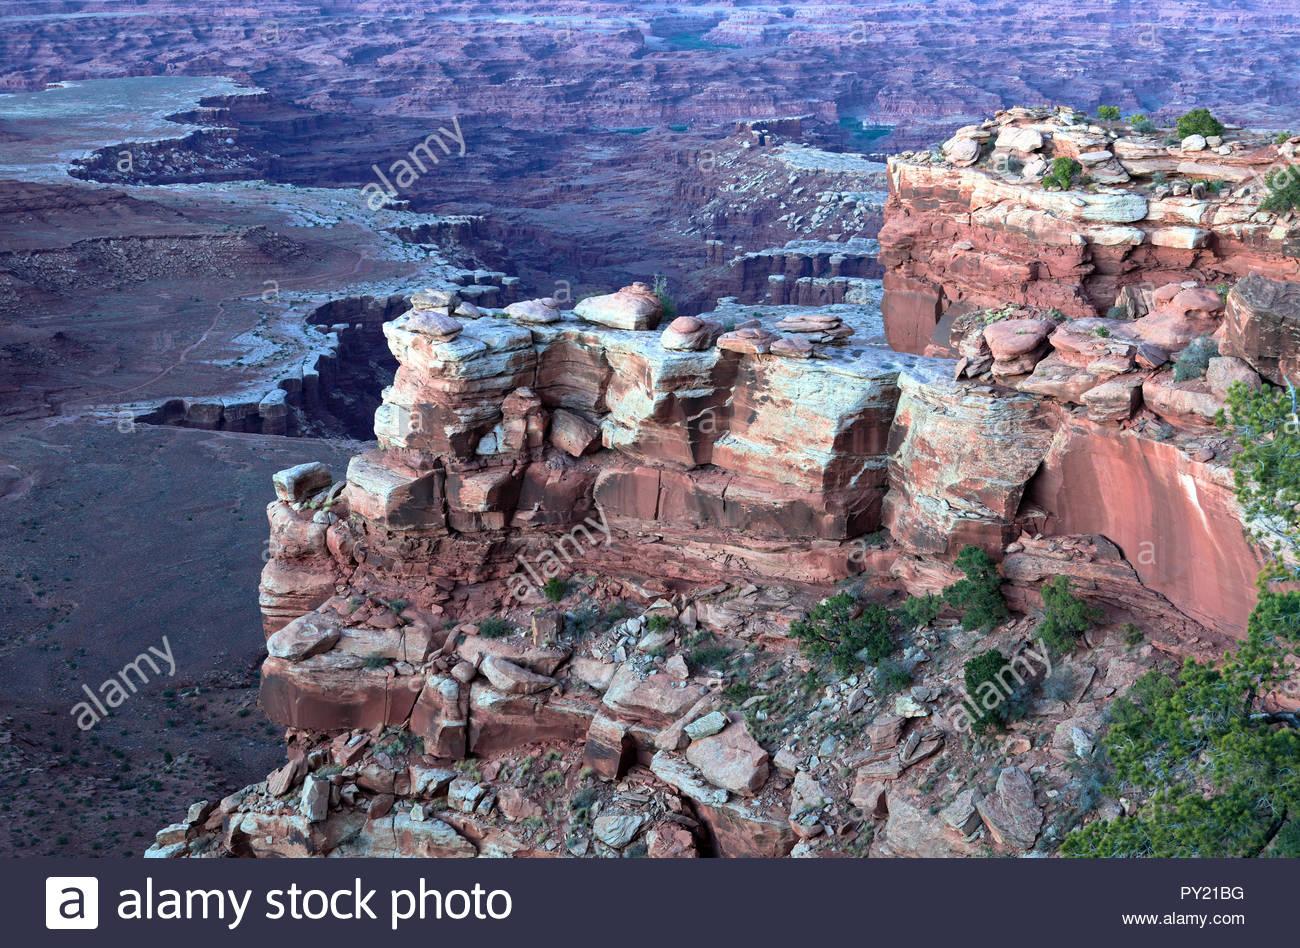 Detailansicht der Abend Canyonlands, Moab, Utah, USA Stockbild